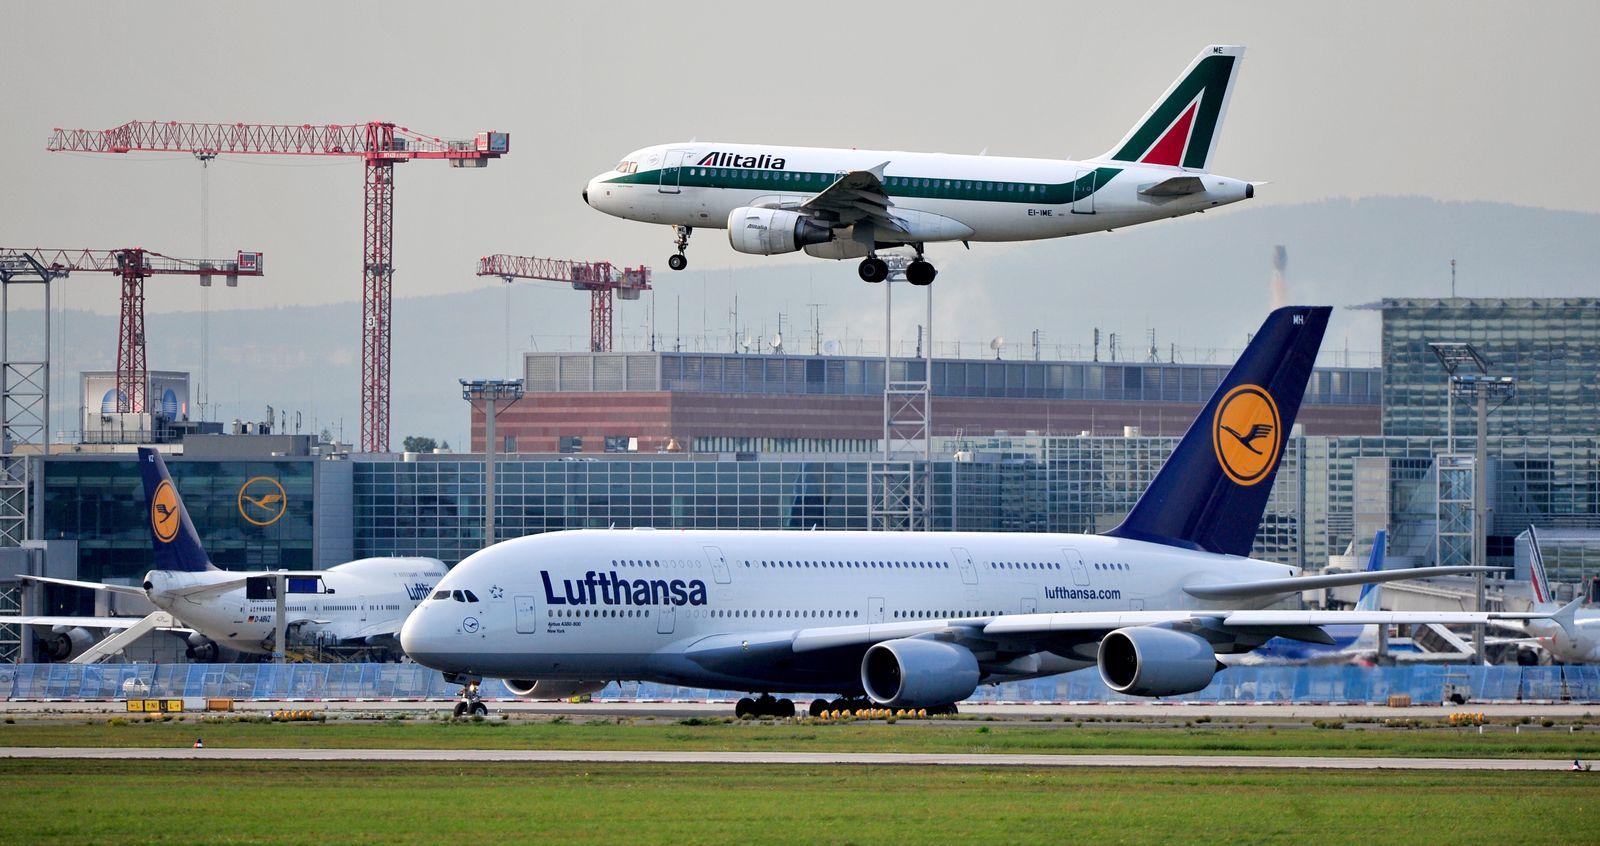 Alitalia und Lufthansa